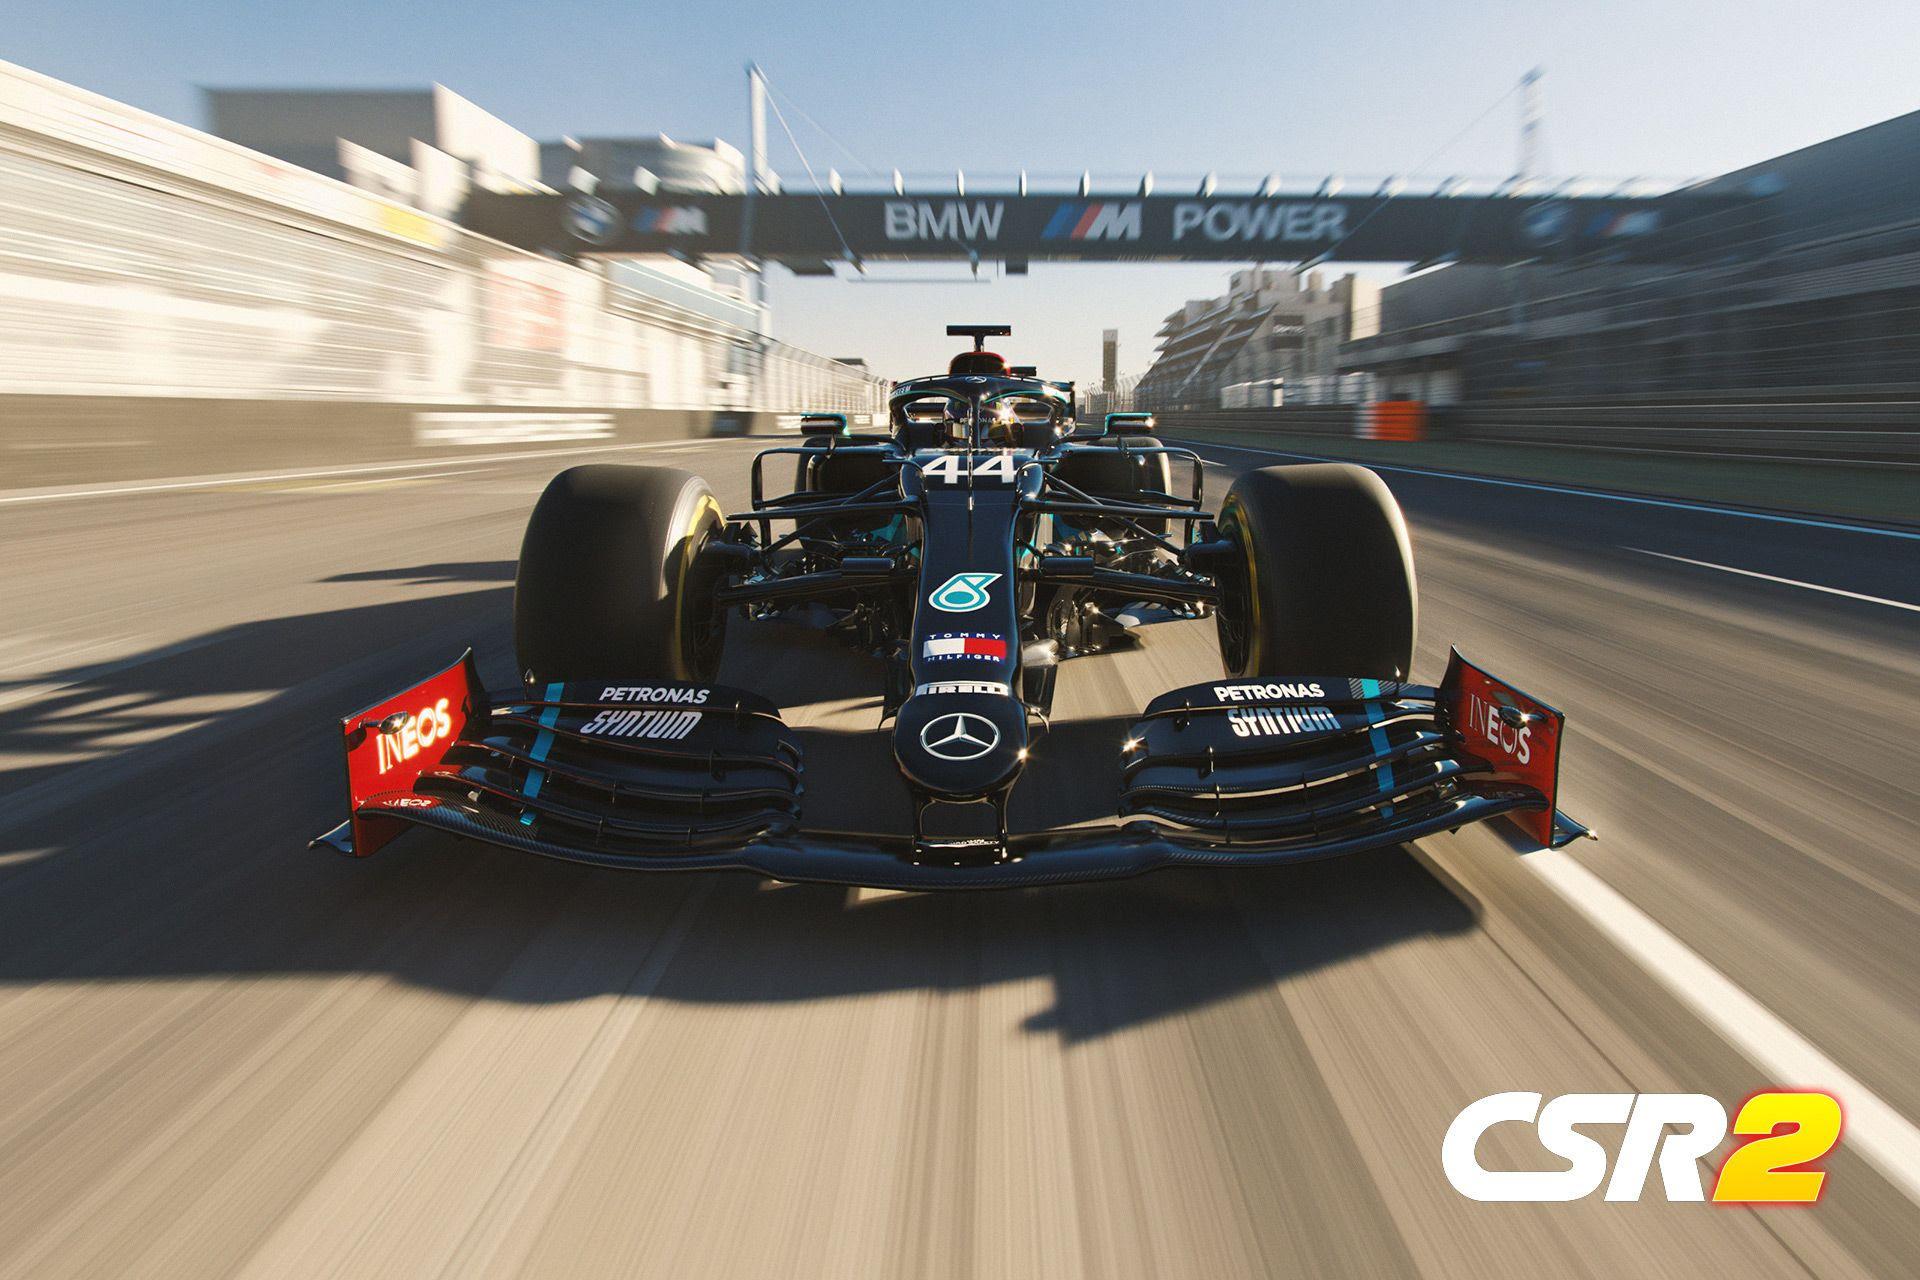 Zynga presenta il nuovo multi-evento Europe Series di CSR Racing 2